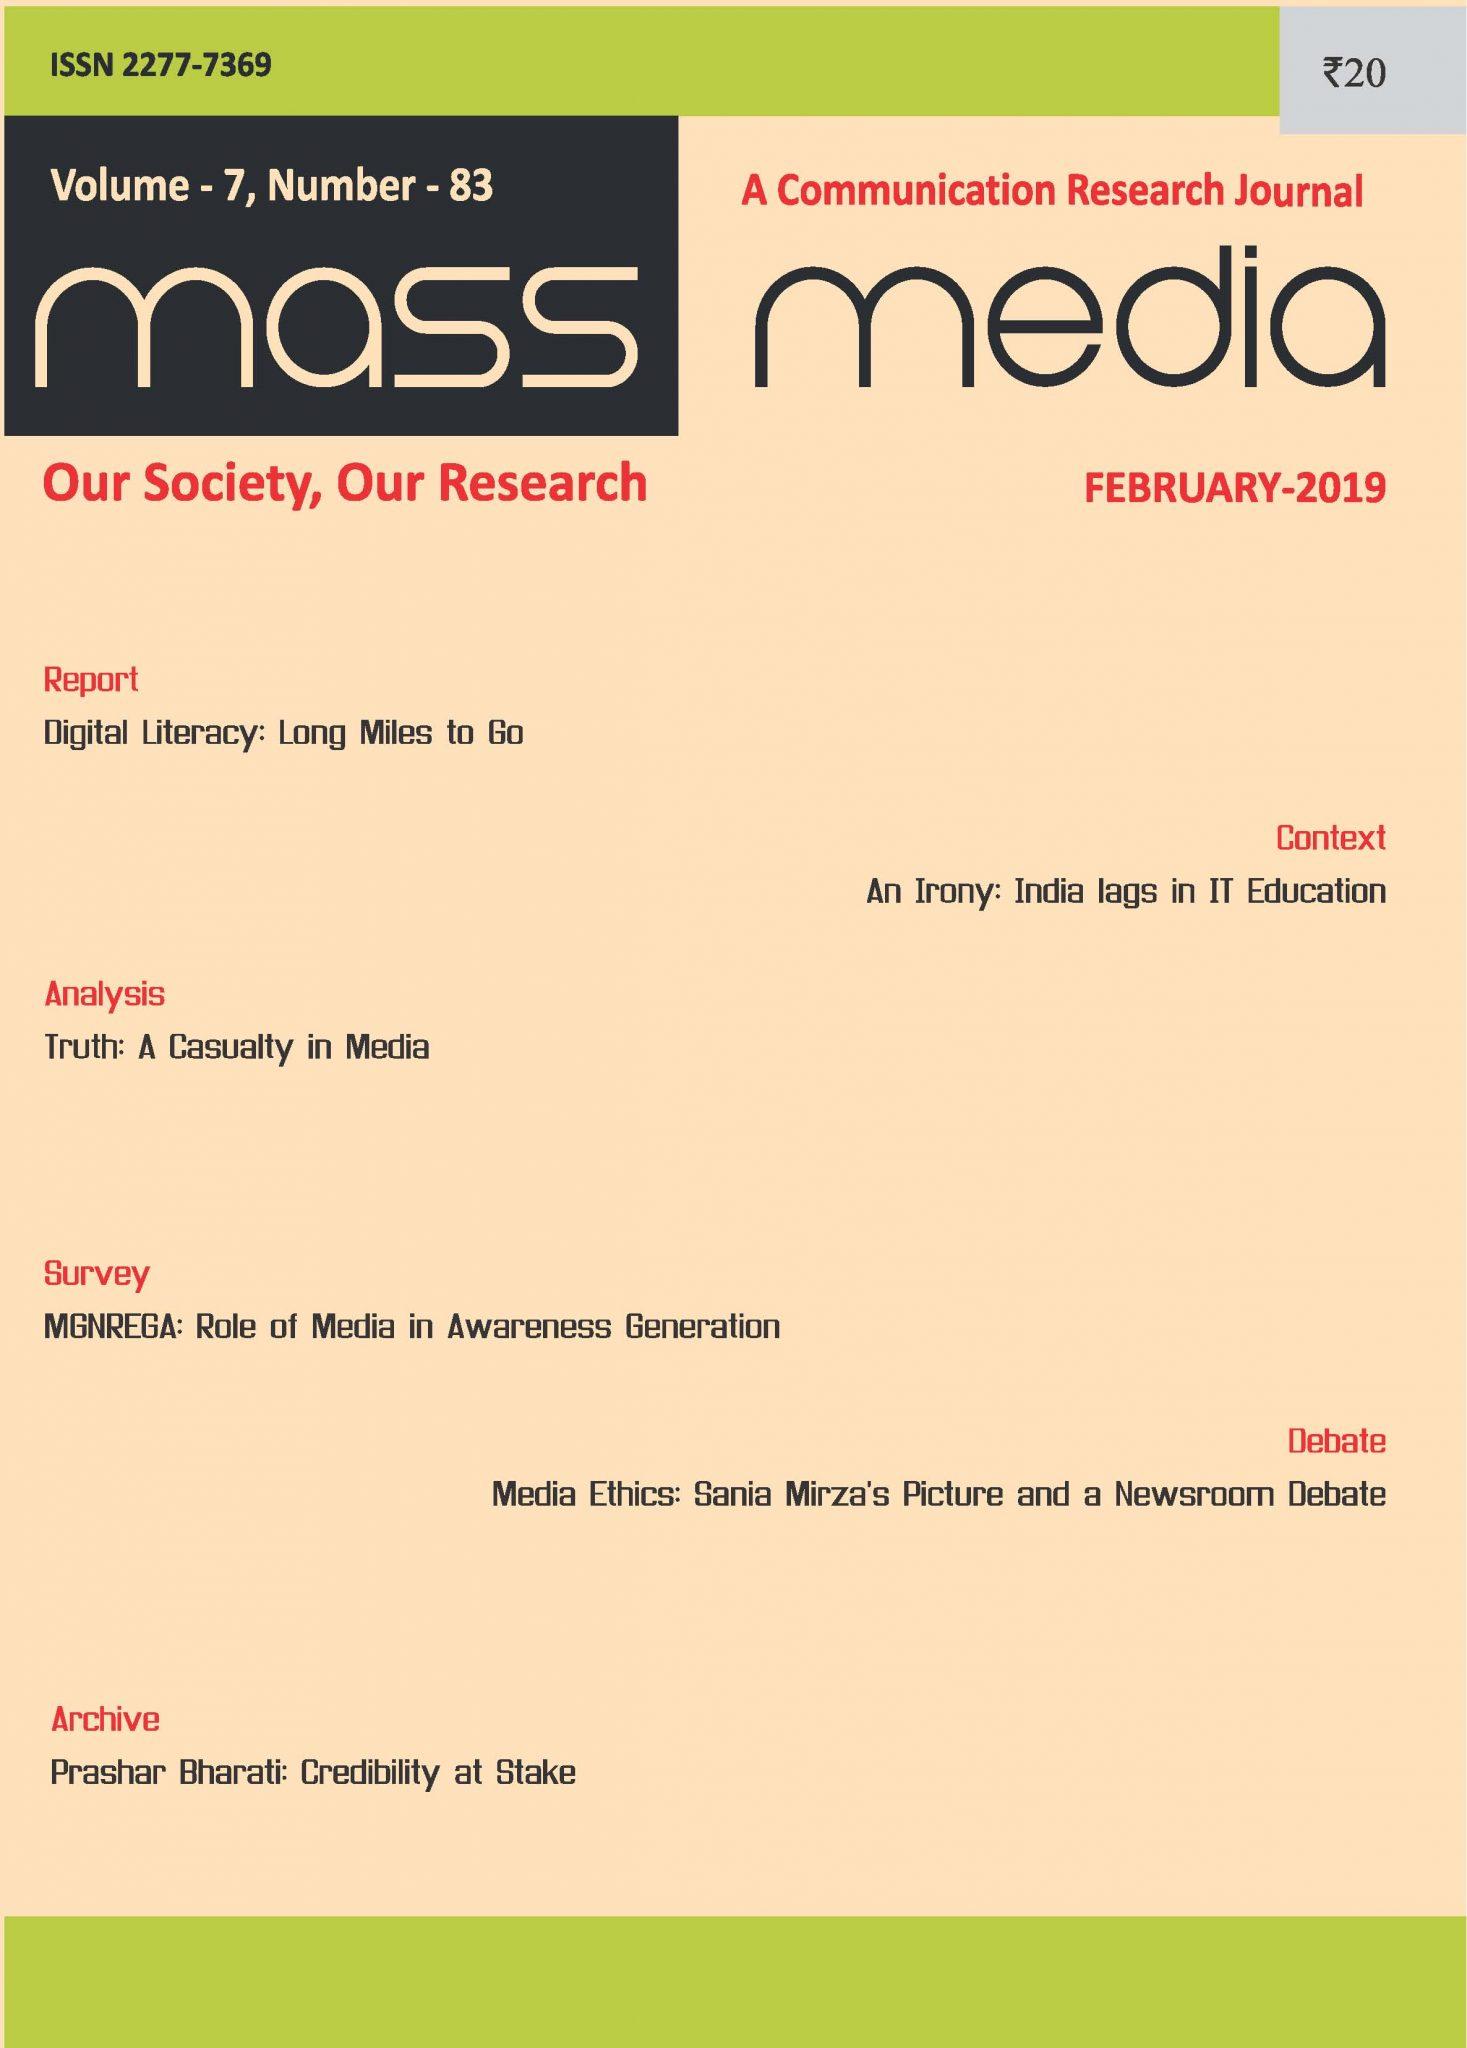 Mass Media (February 2019)